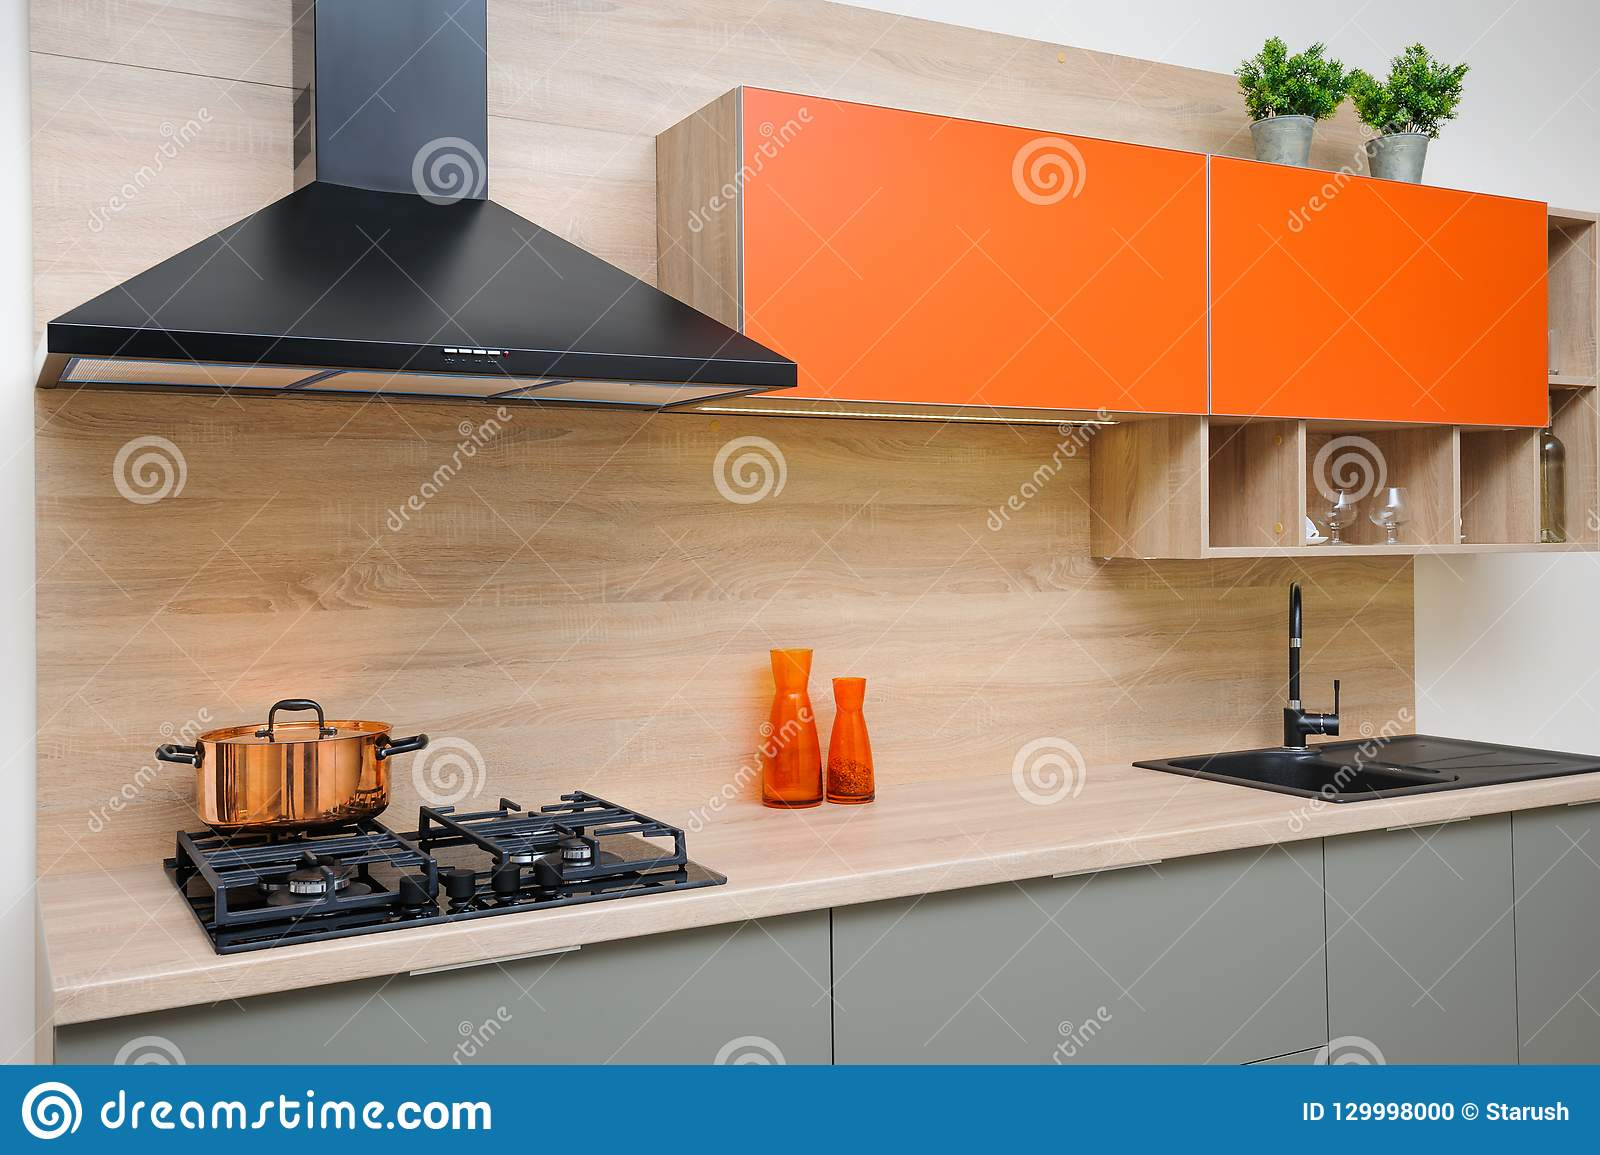 Luxury modern kitchen stock photo. Image of design, plants ...